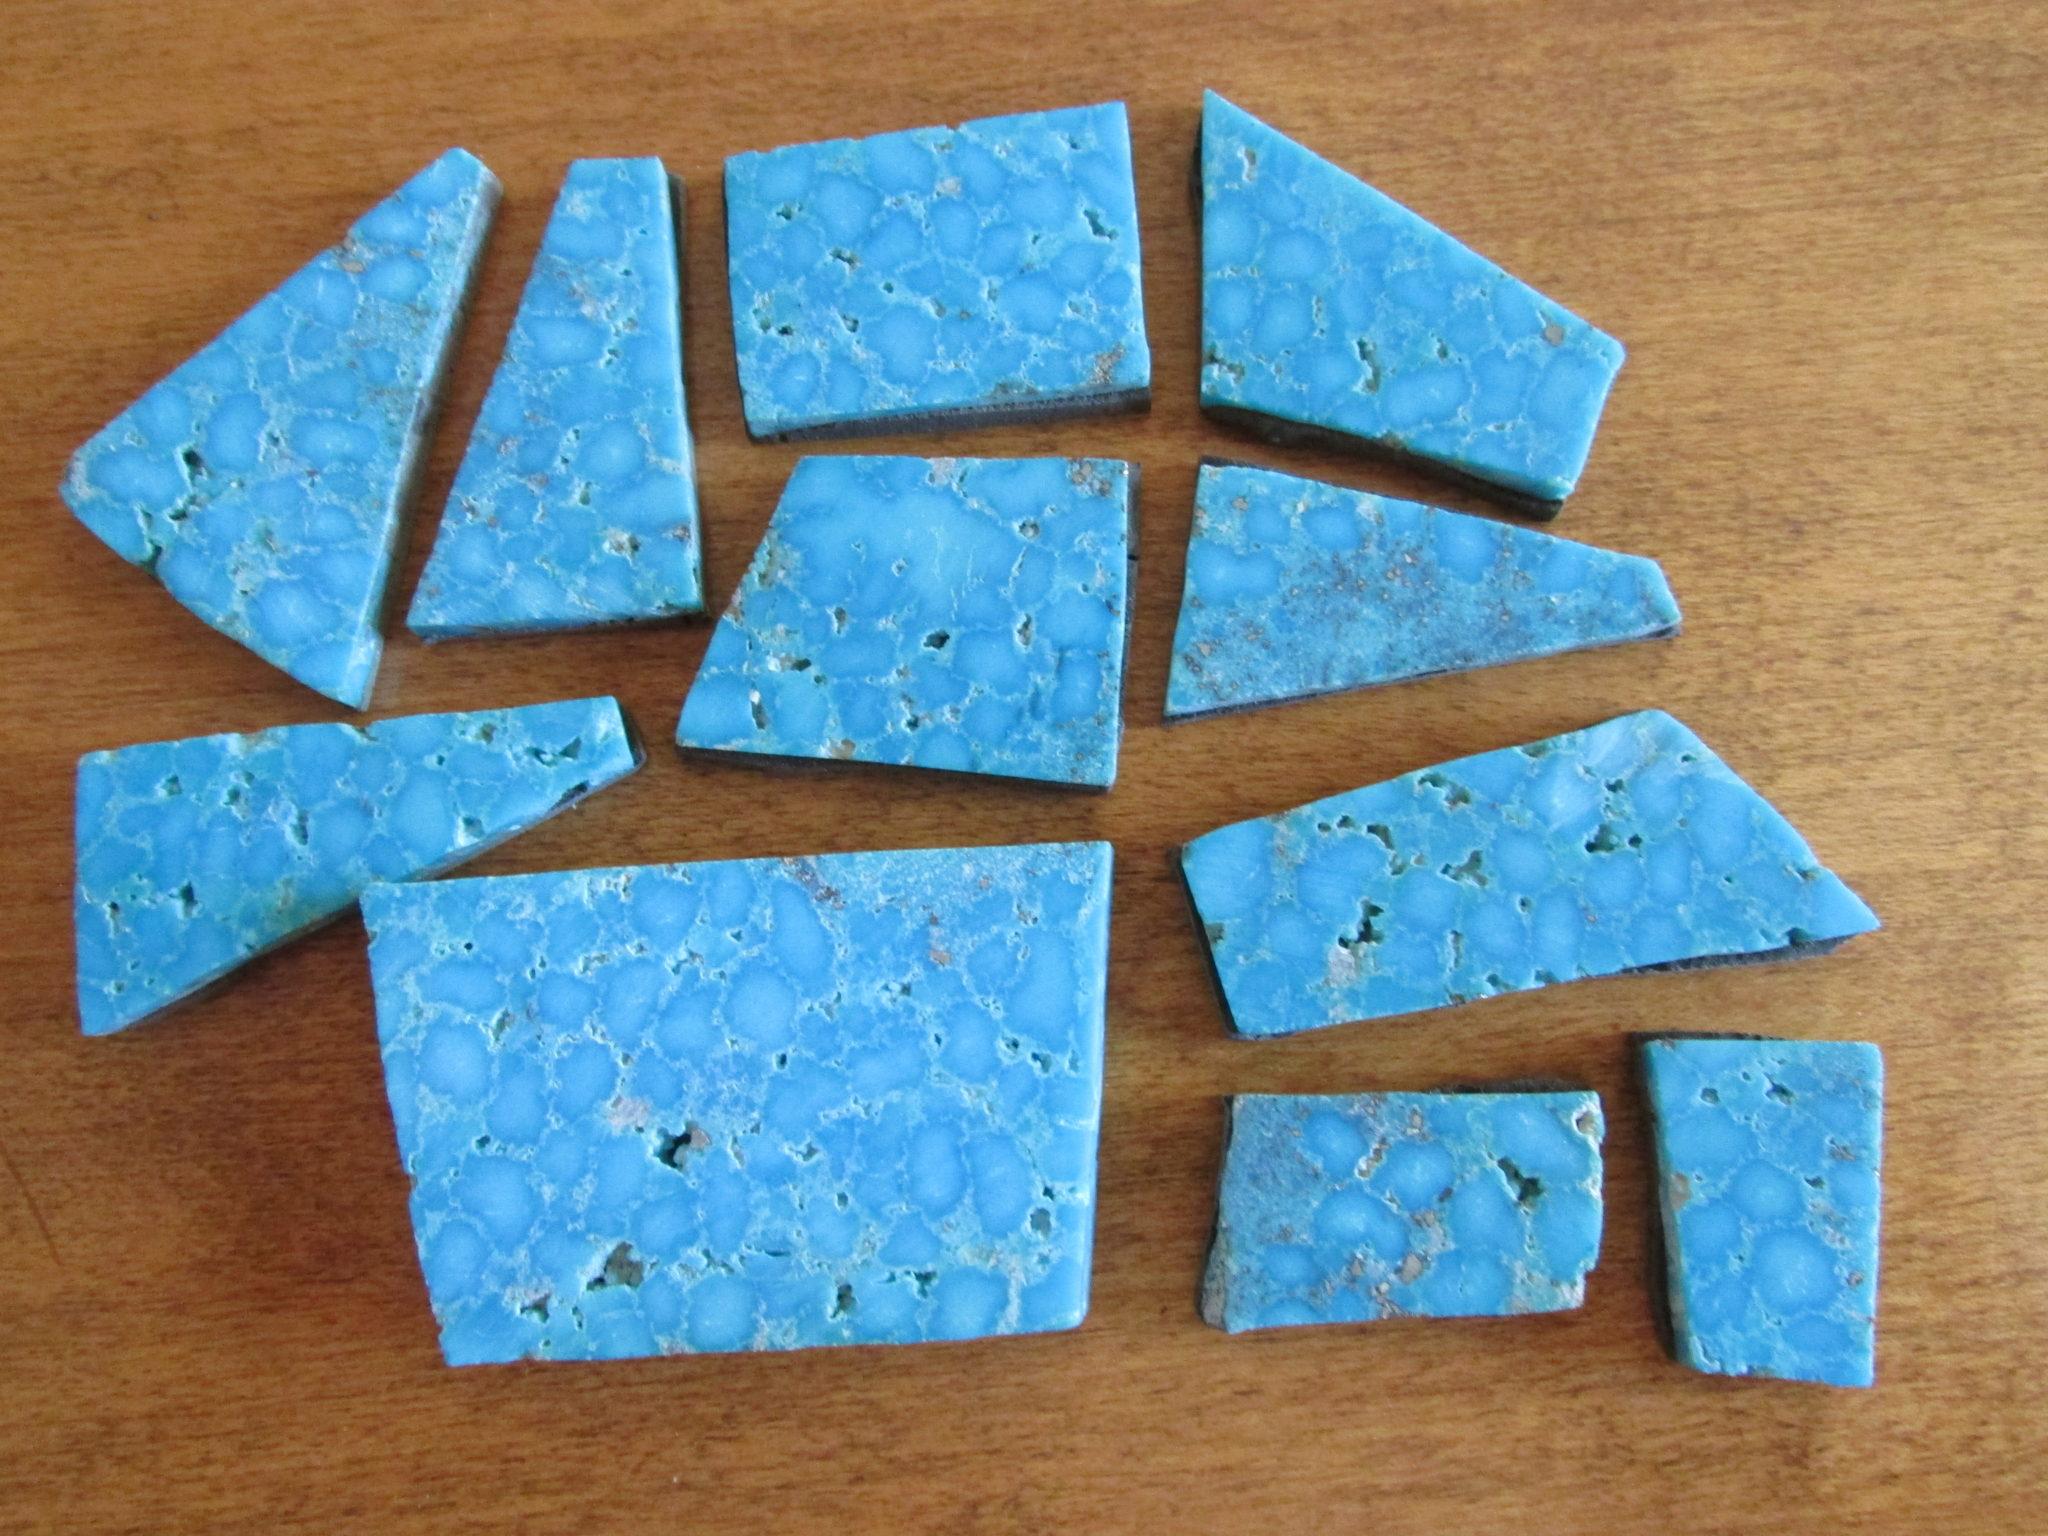 Close-up of Kingman waterweb turquoise slab